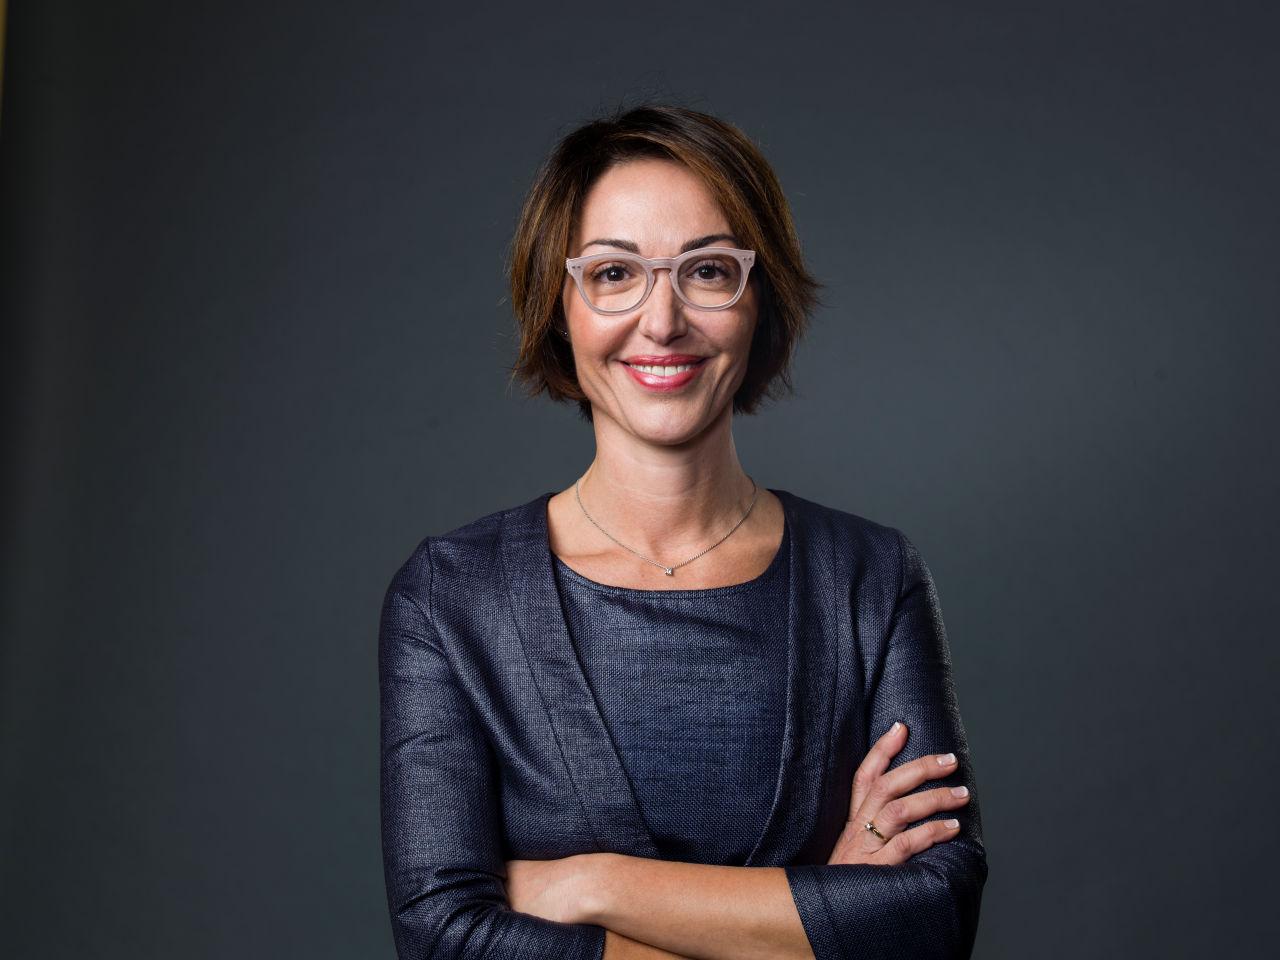 Dott.ssa Orlandini Maria Cristina